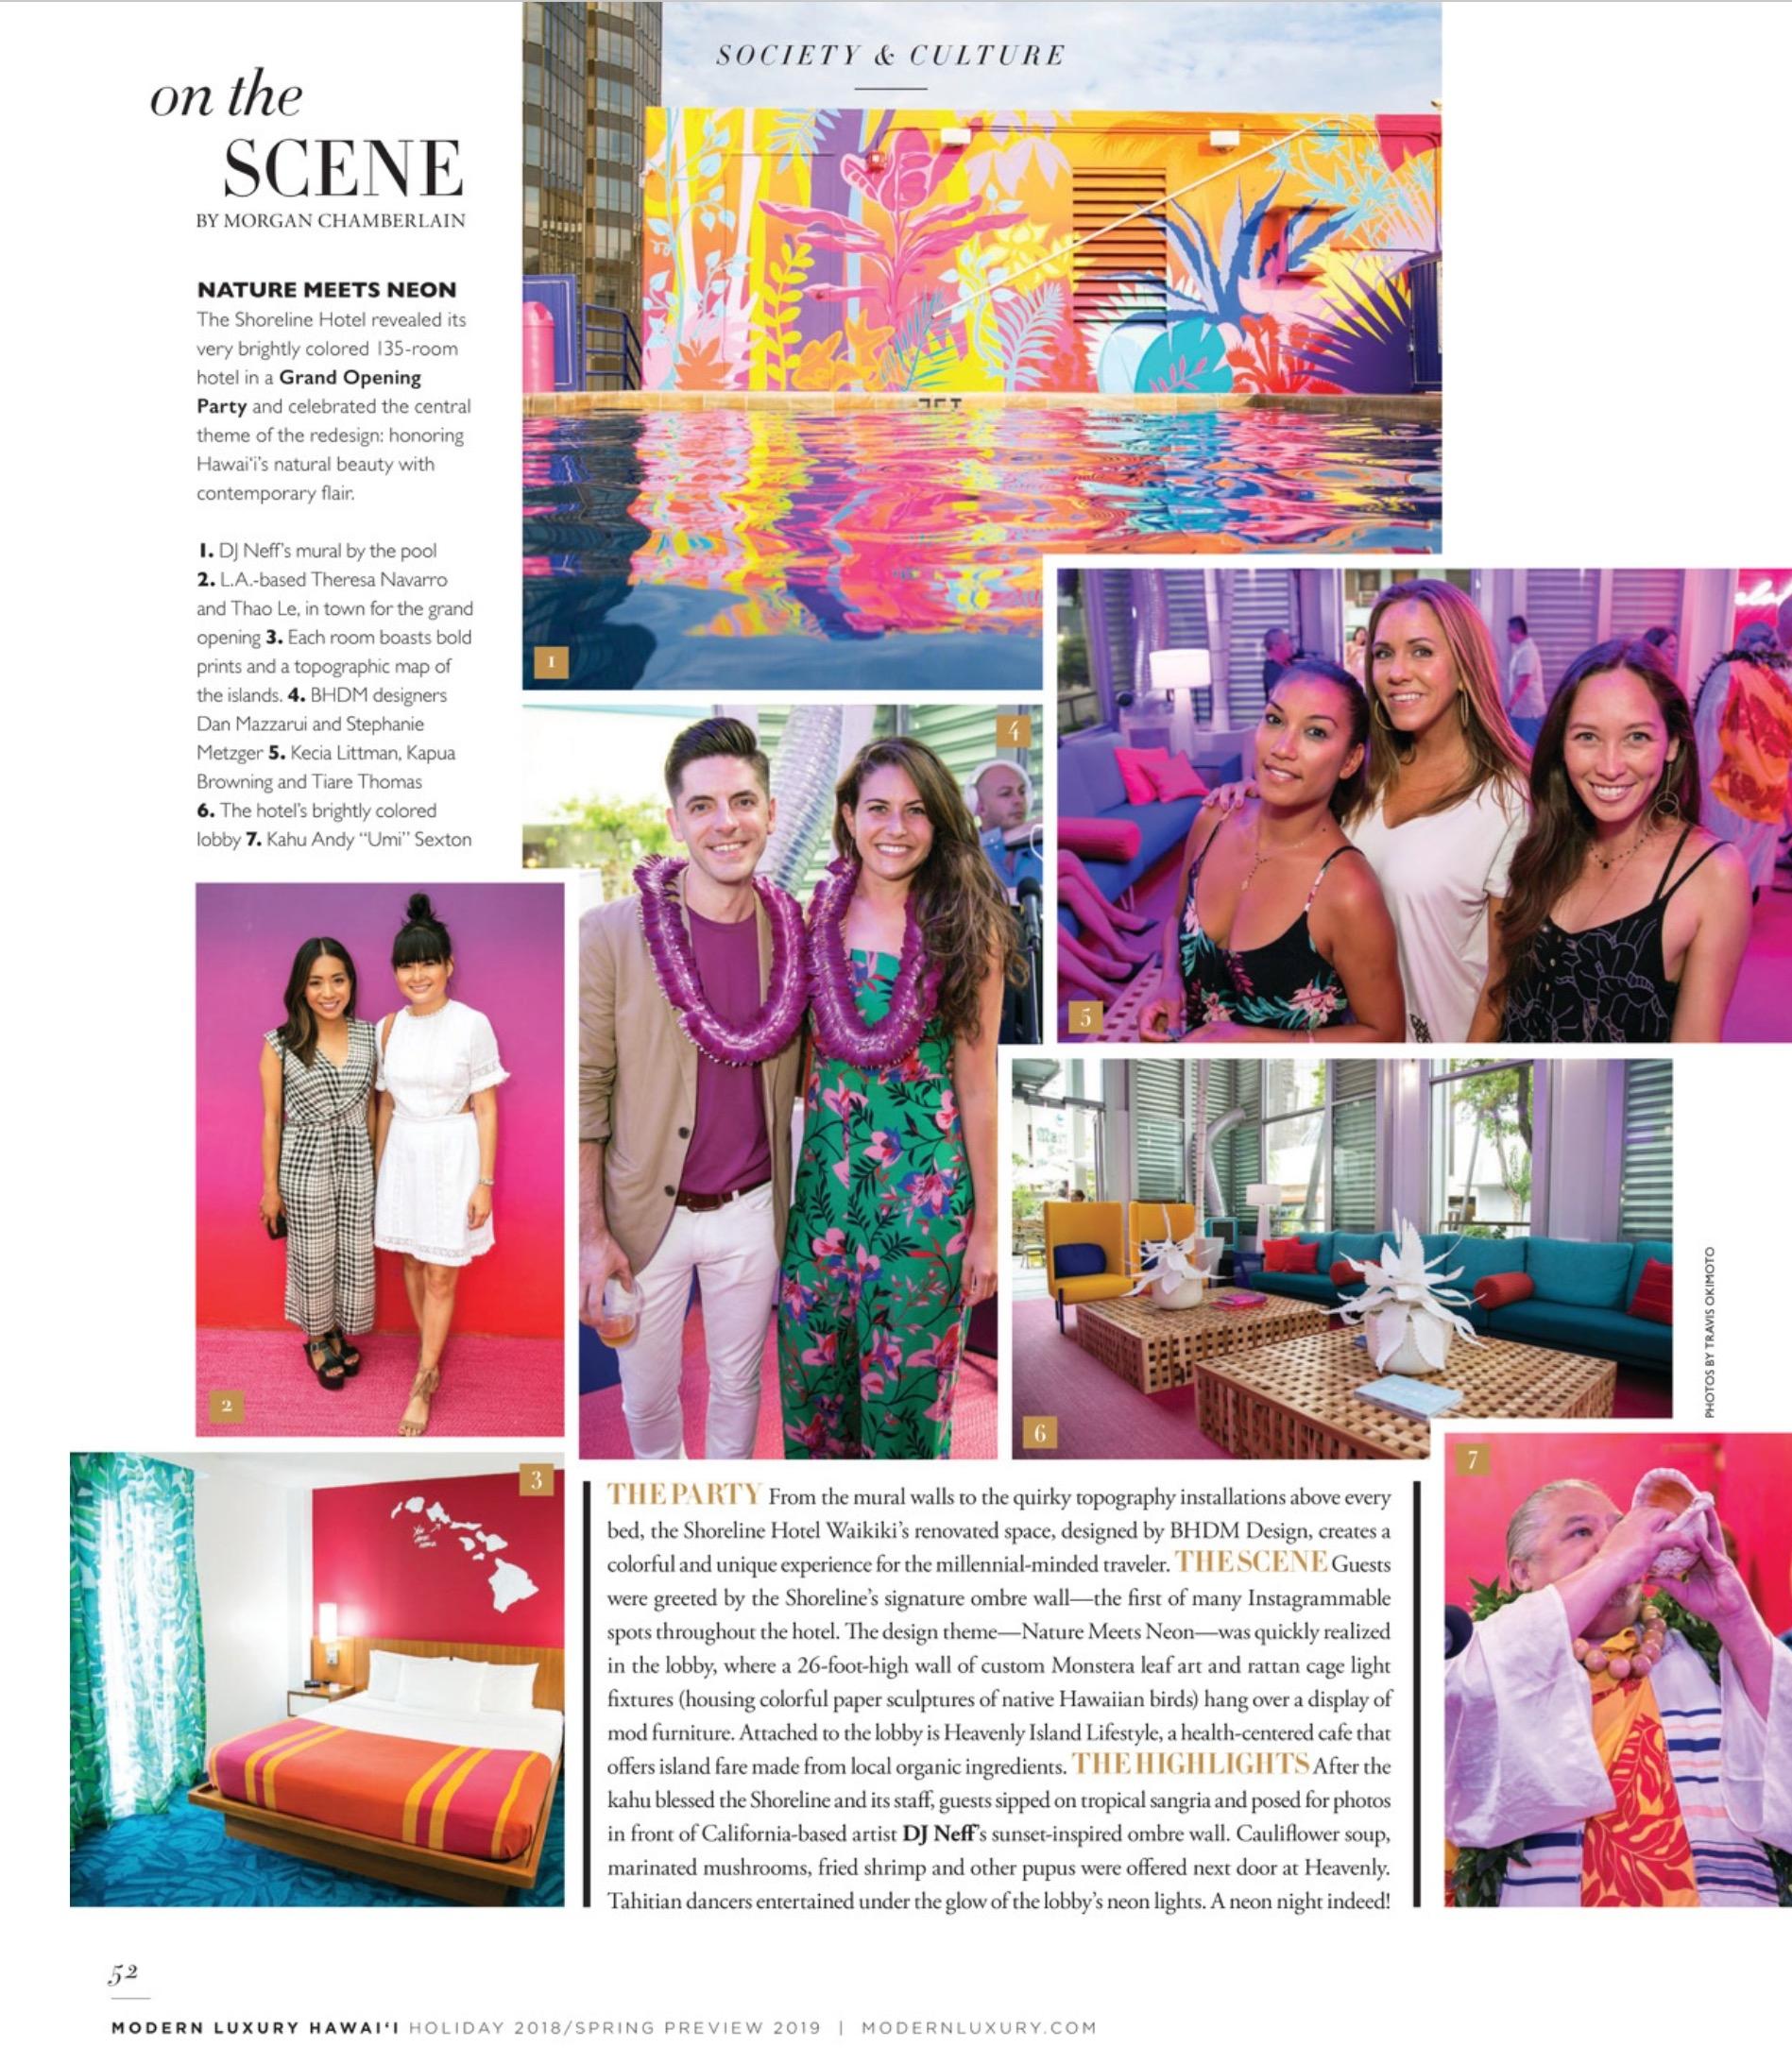 Shoreline Hotel Waikiki_Modern Luxury Hawaii_Holiday 2018_Preview 2019_Feature_2.JPG.JPG